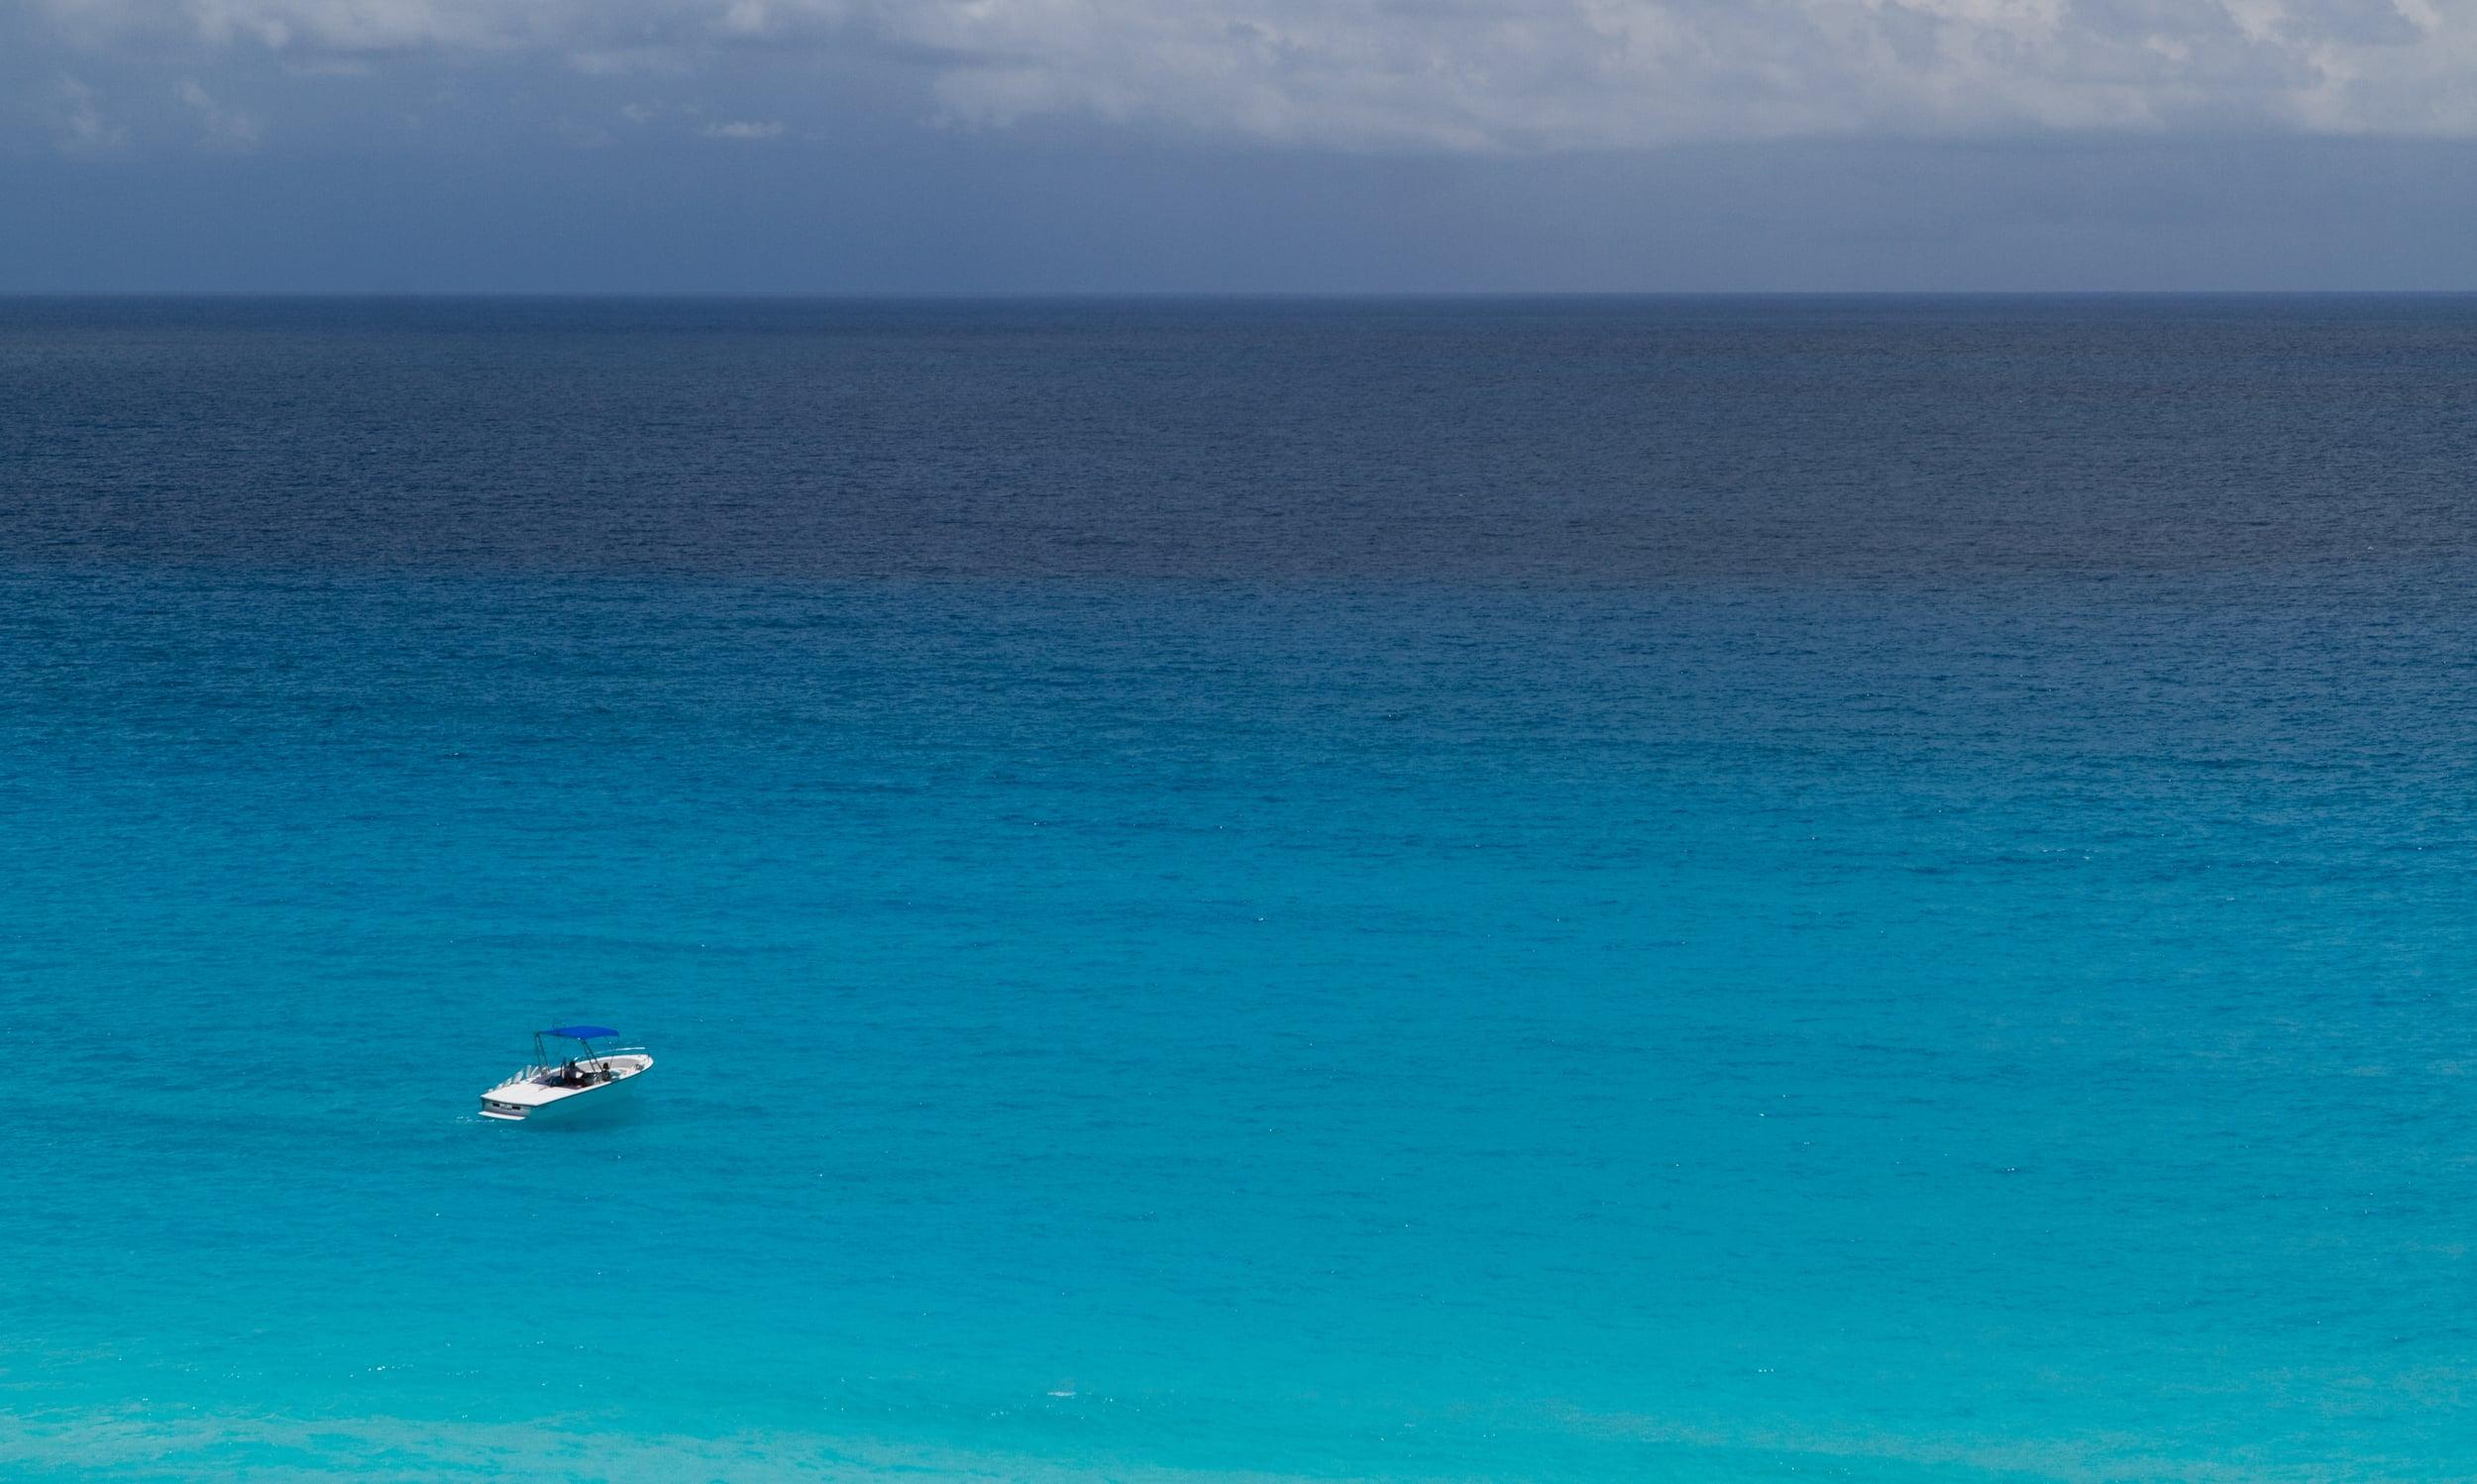 Cancun boat.jpg